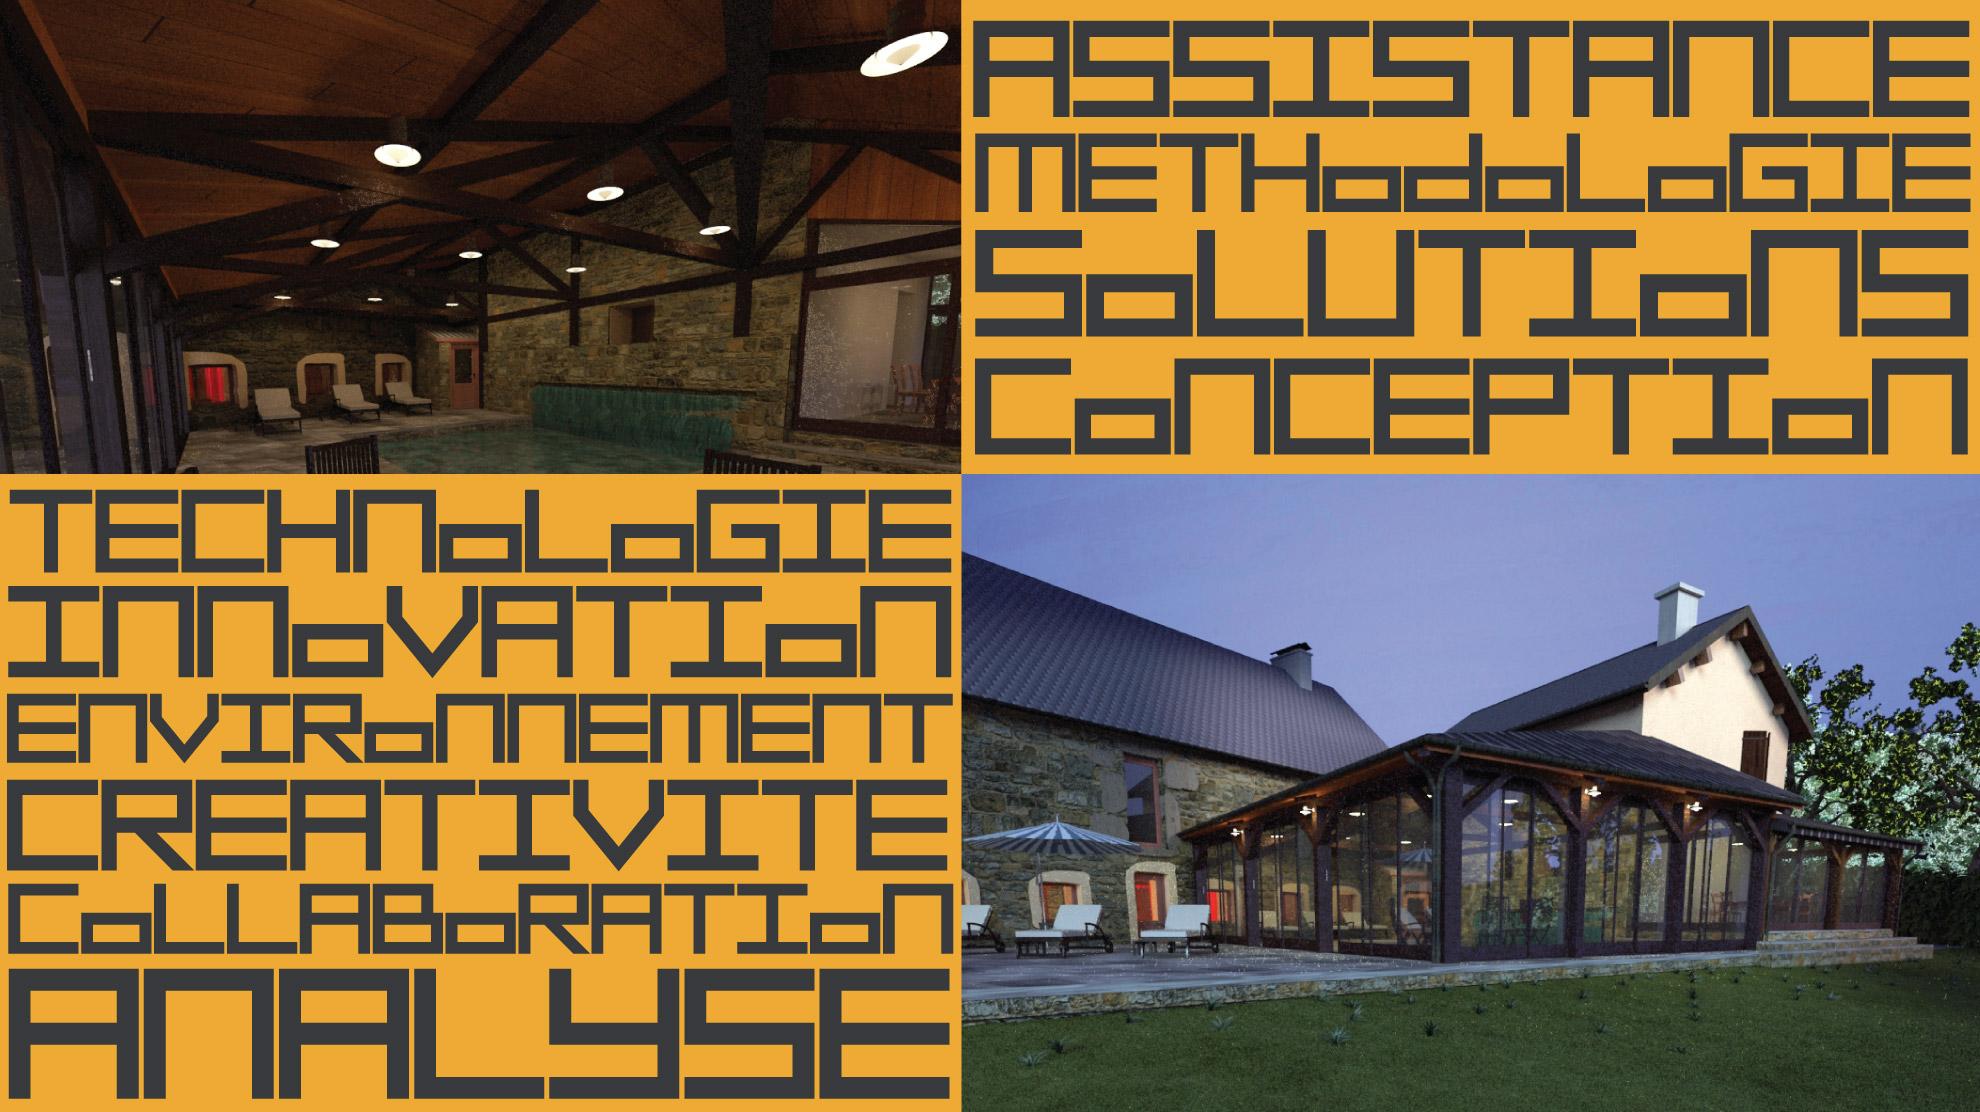 c_pa_design_produit_design_image_illustration-3d_realisation_archi_int-realiste